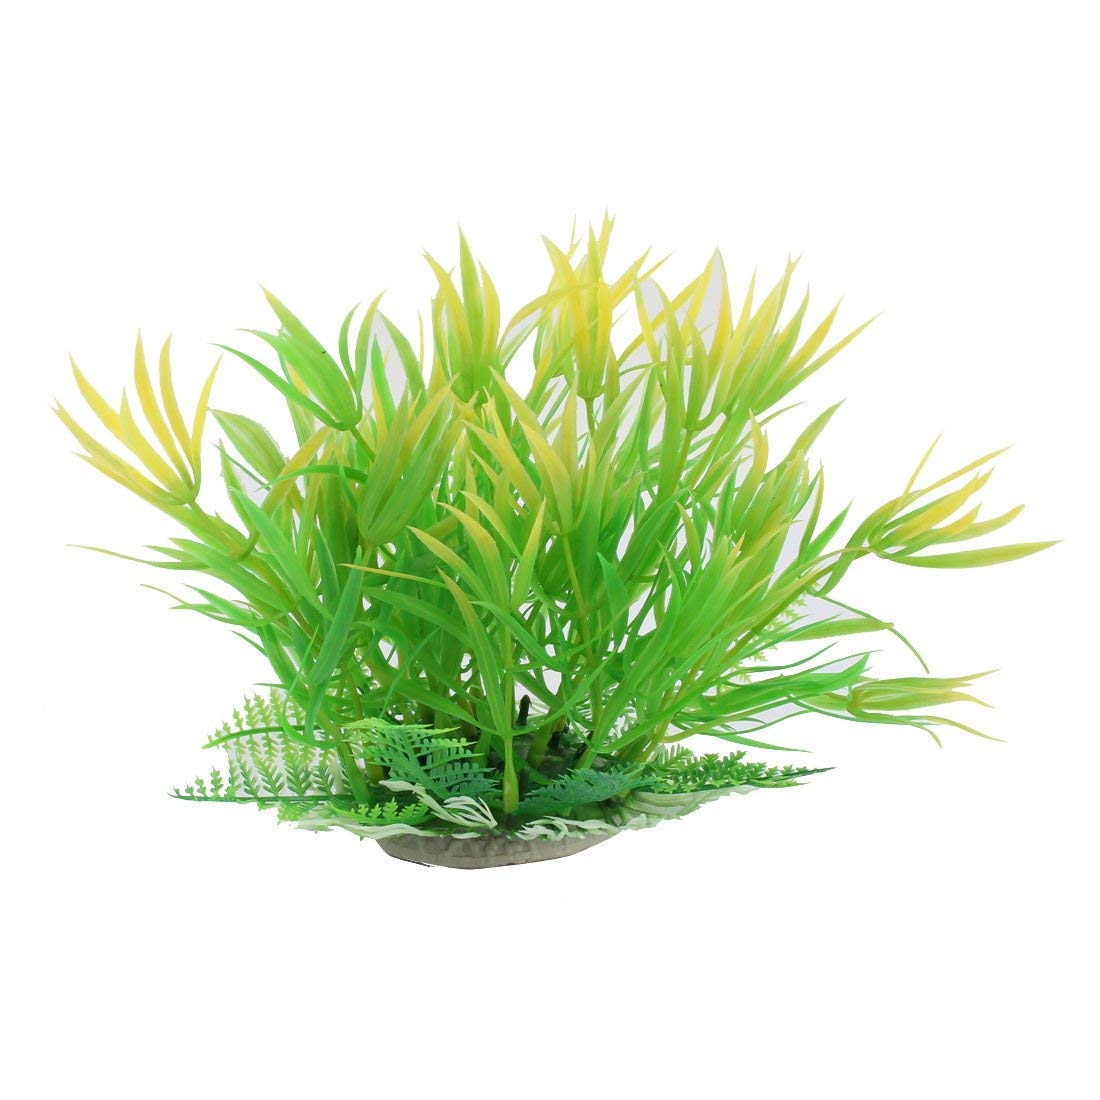 1Pc Plastic Buckhorn Shape Aquarium Decoration Artificial Grass Plant Green orange